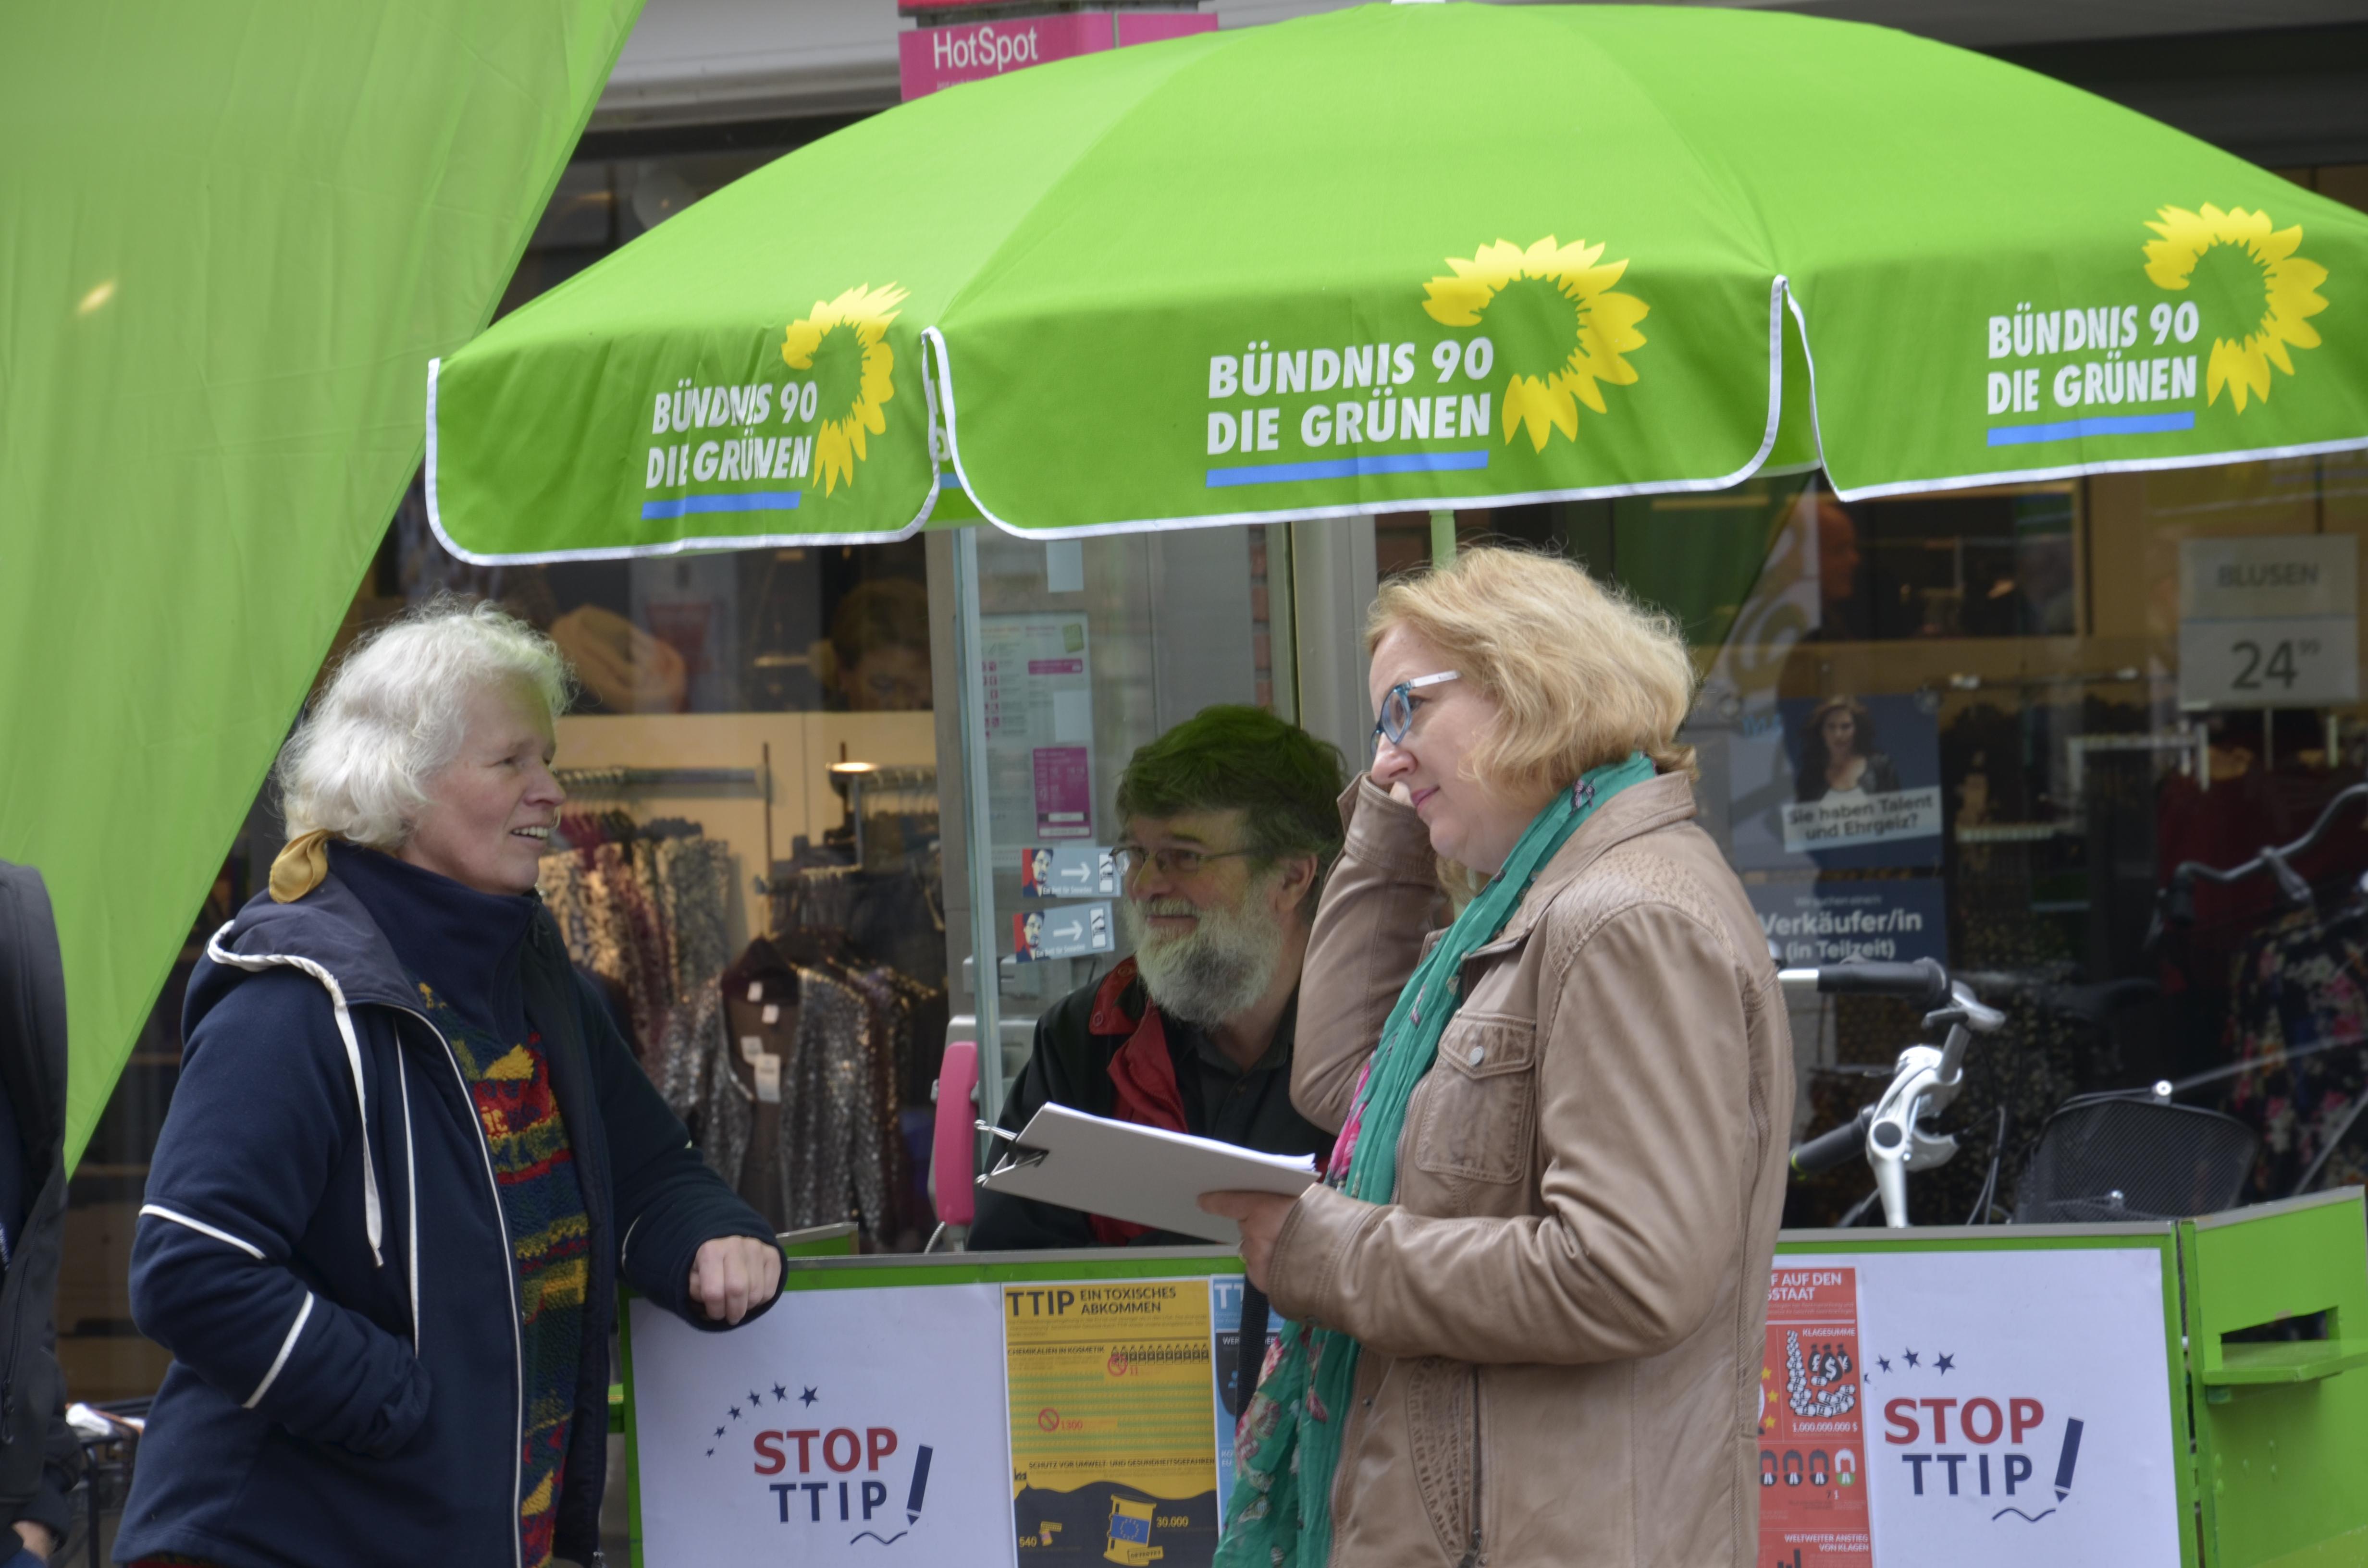 TTIP_Slow Food Bocholt unterstützt Bündnis gegen TTIP